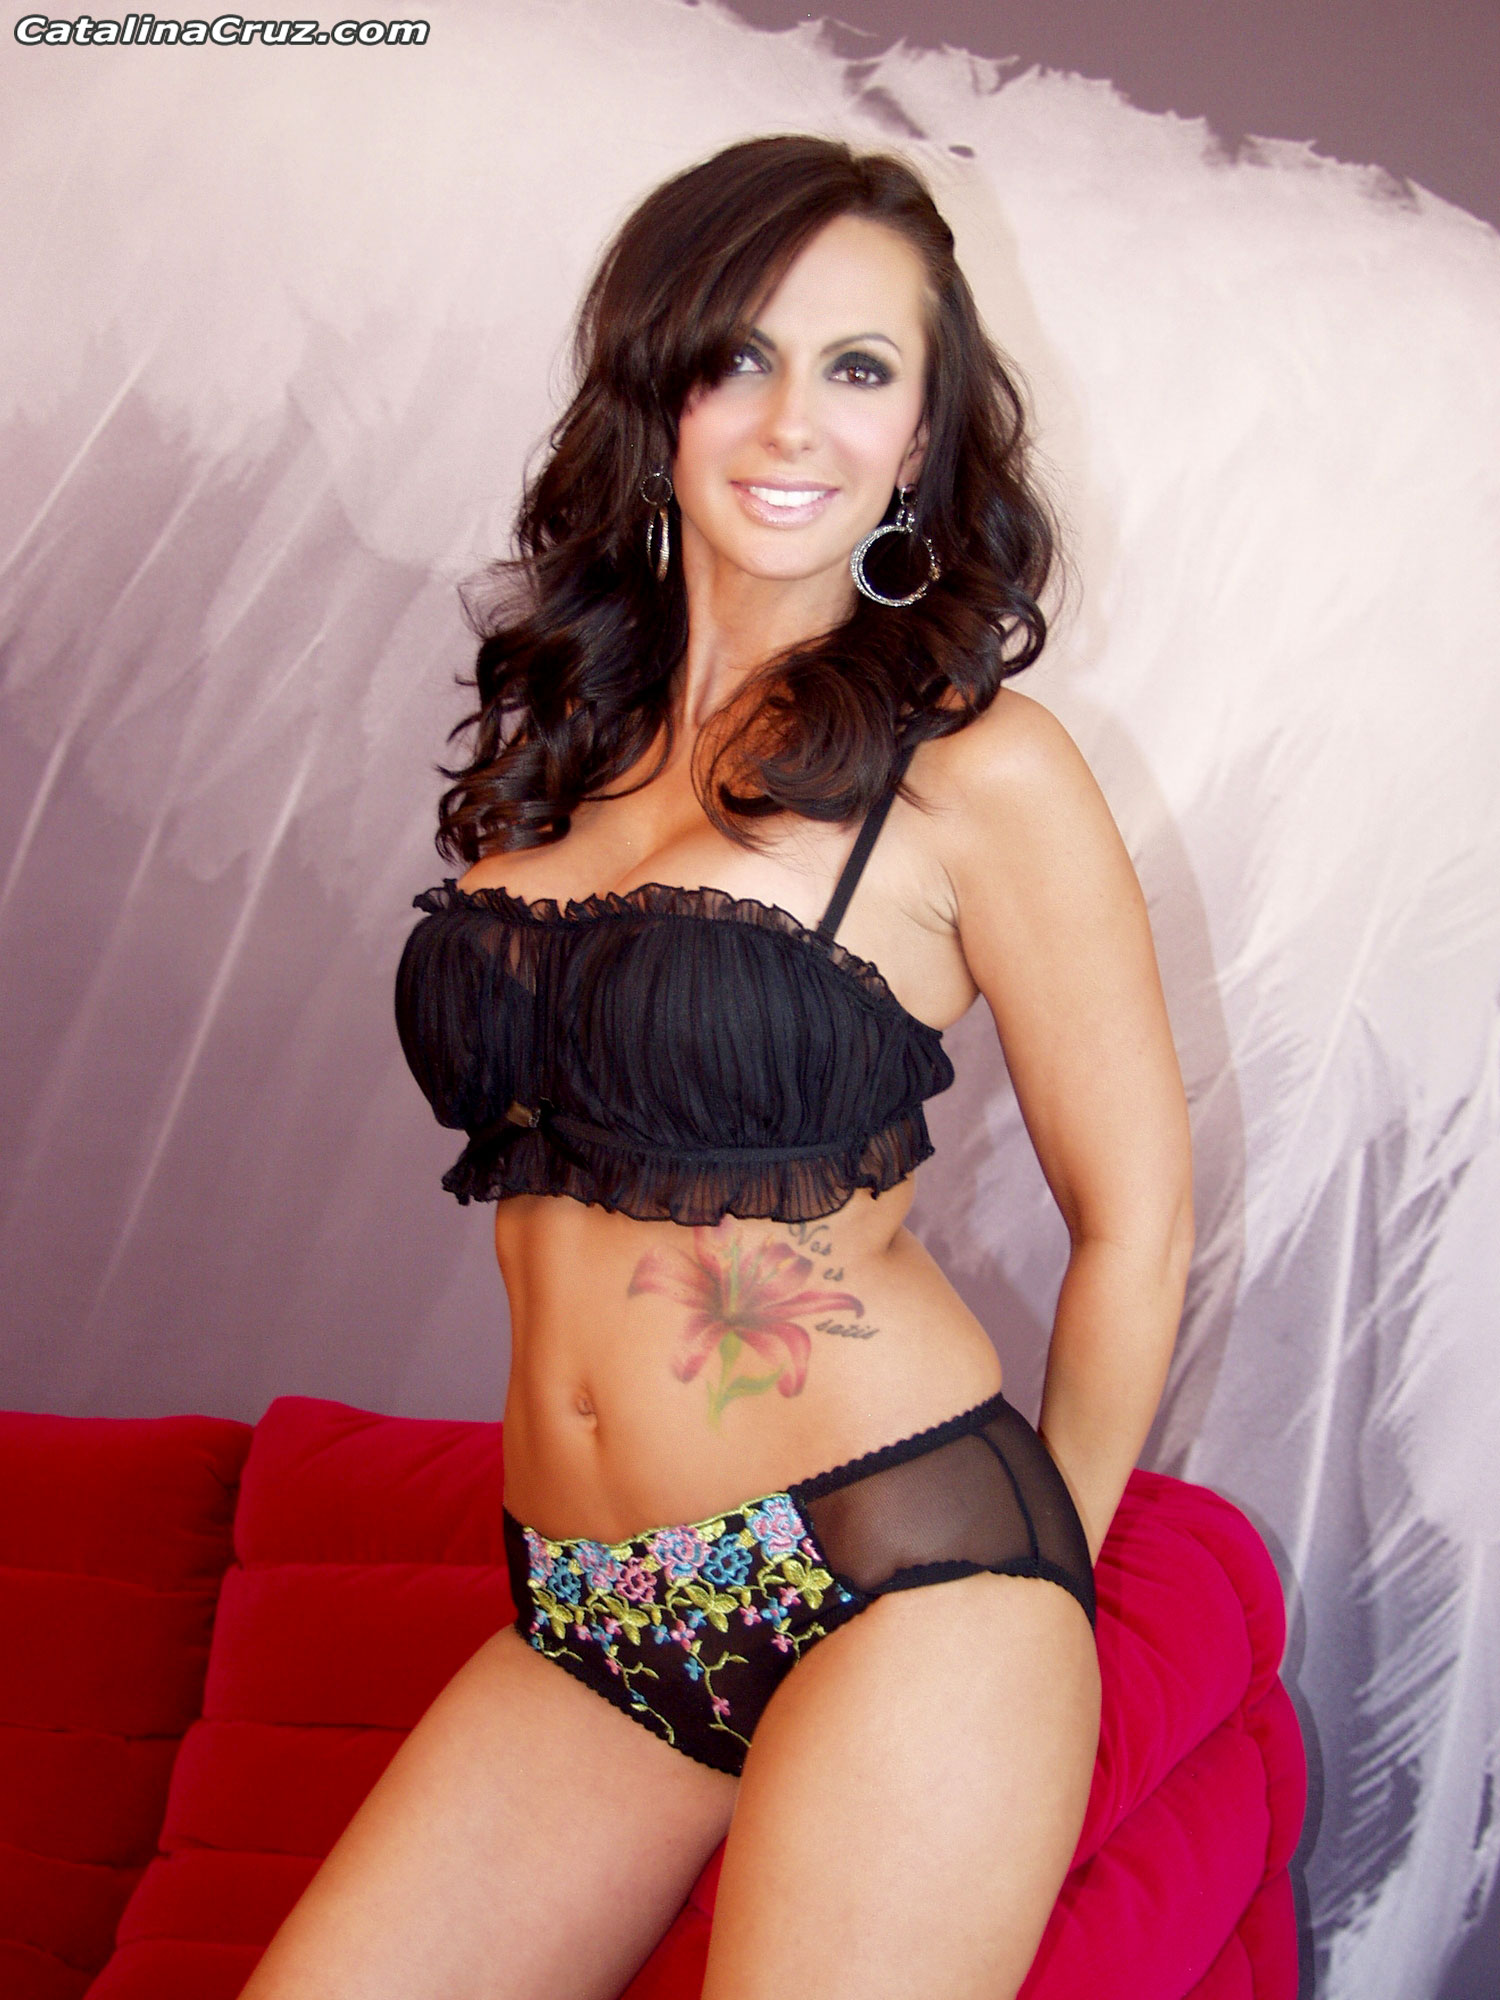 Catalina Cruz Huge Breasts Sitting on a Sofa